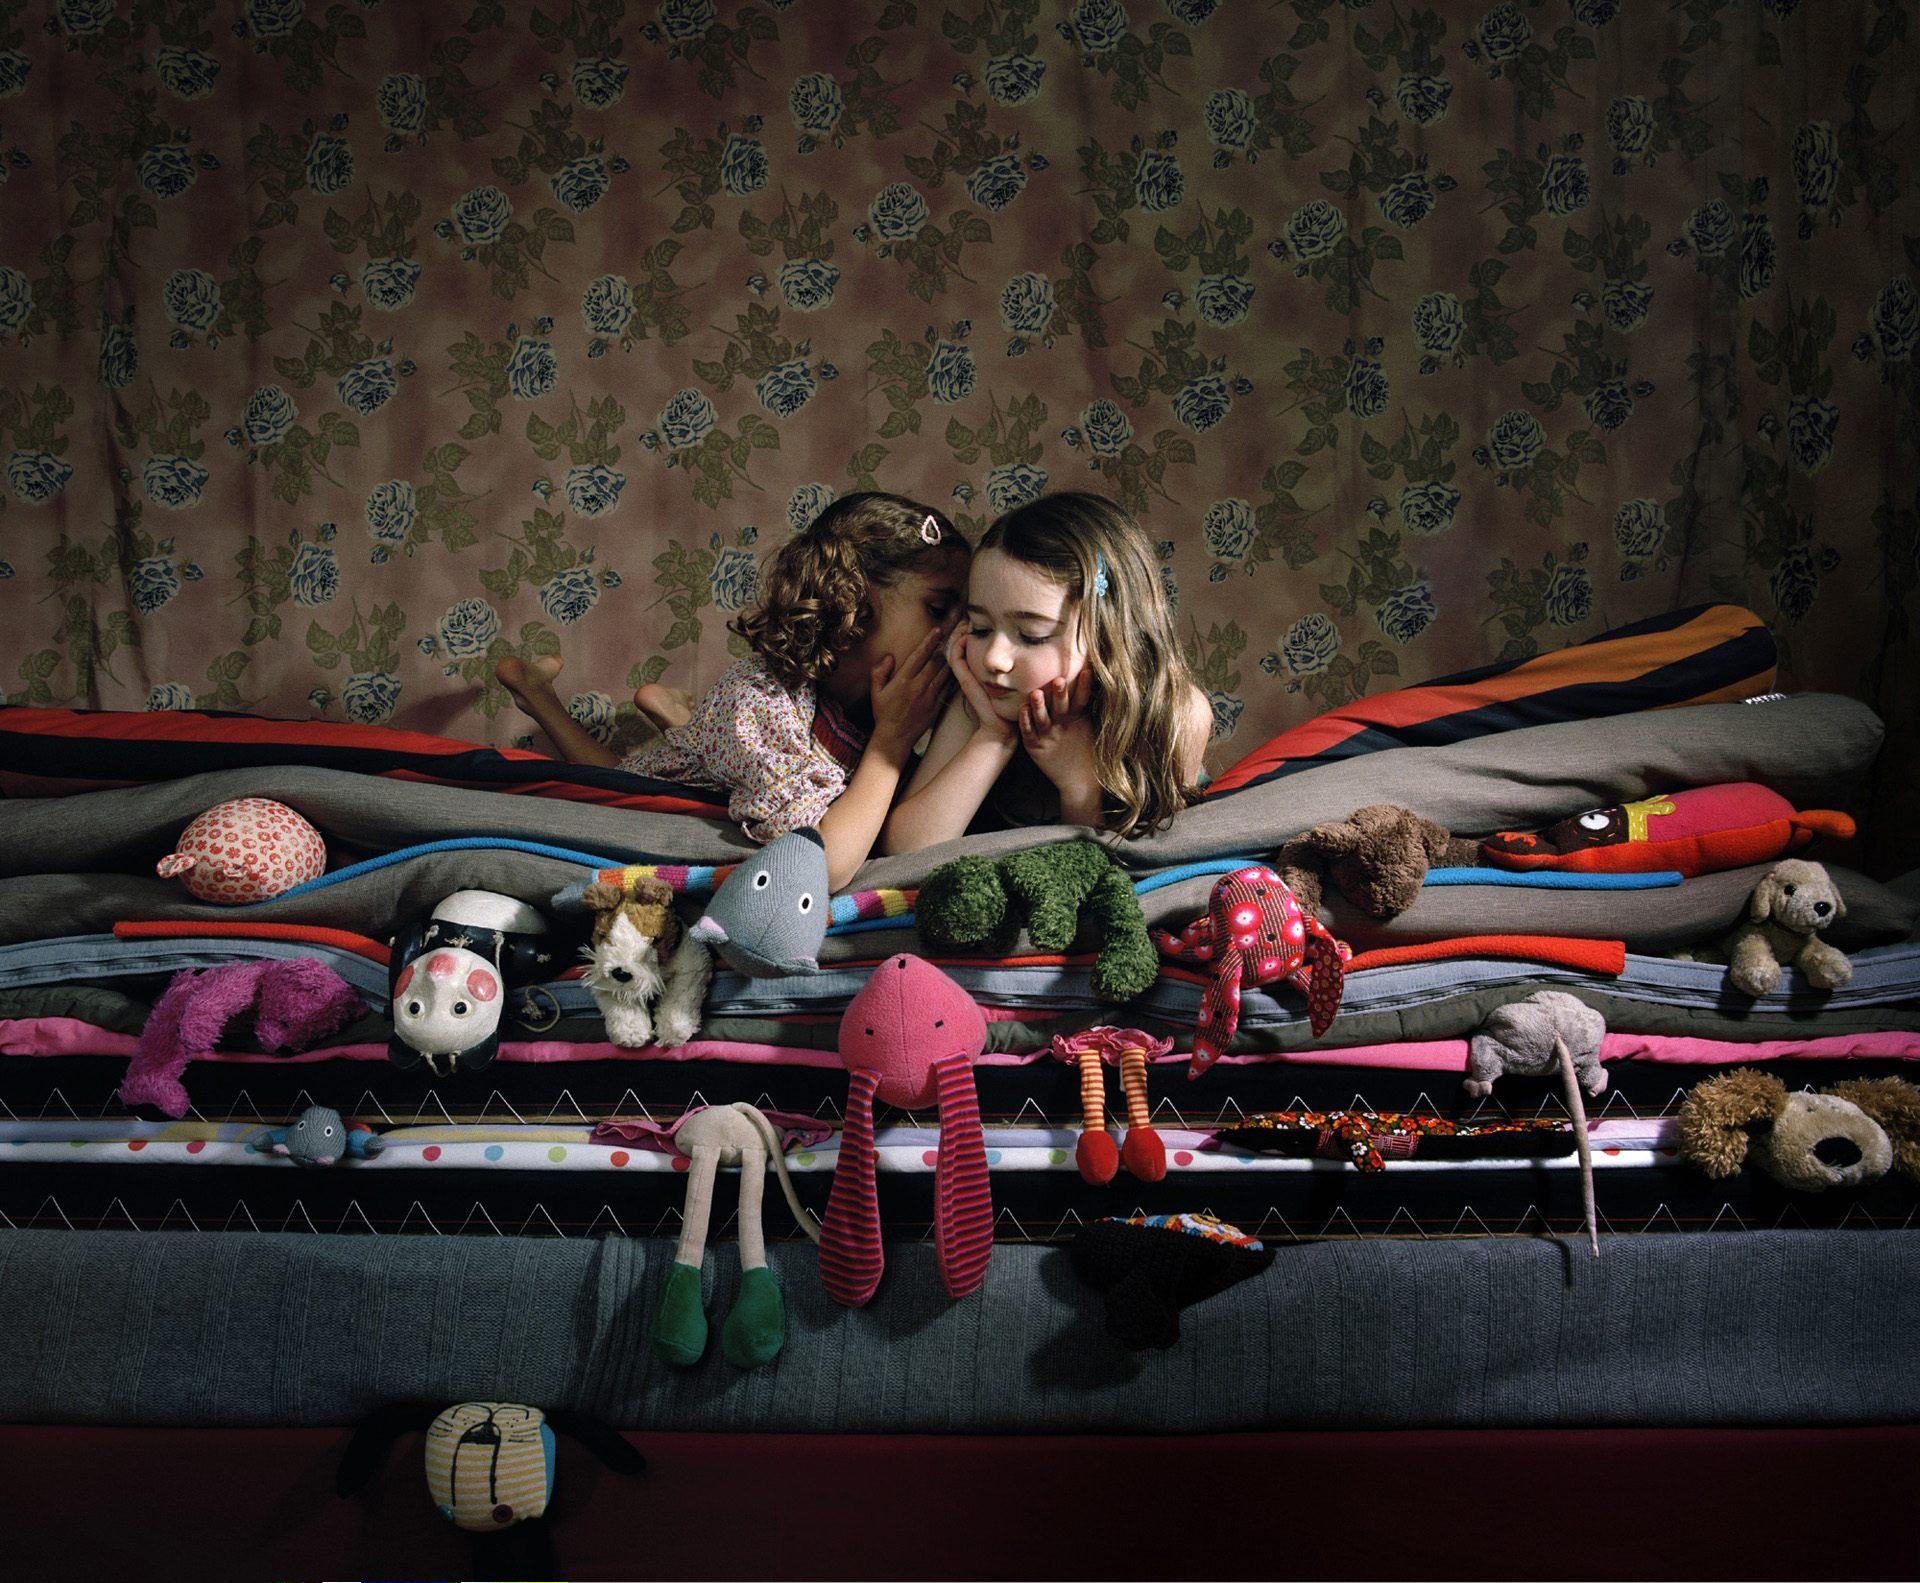 Nadege_Girls_On_Bed